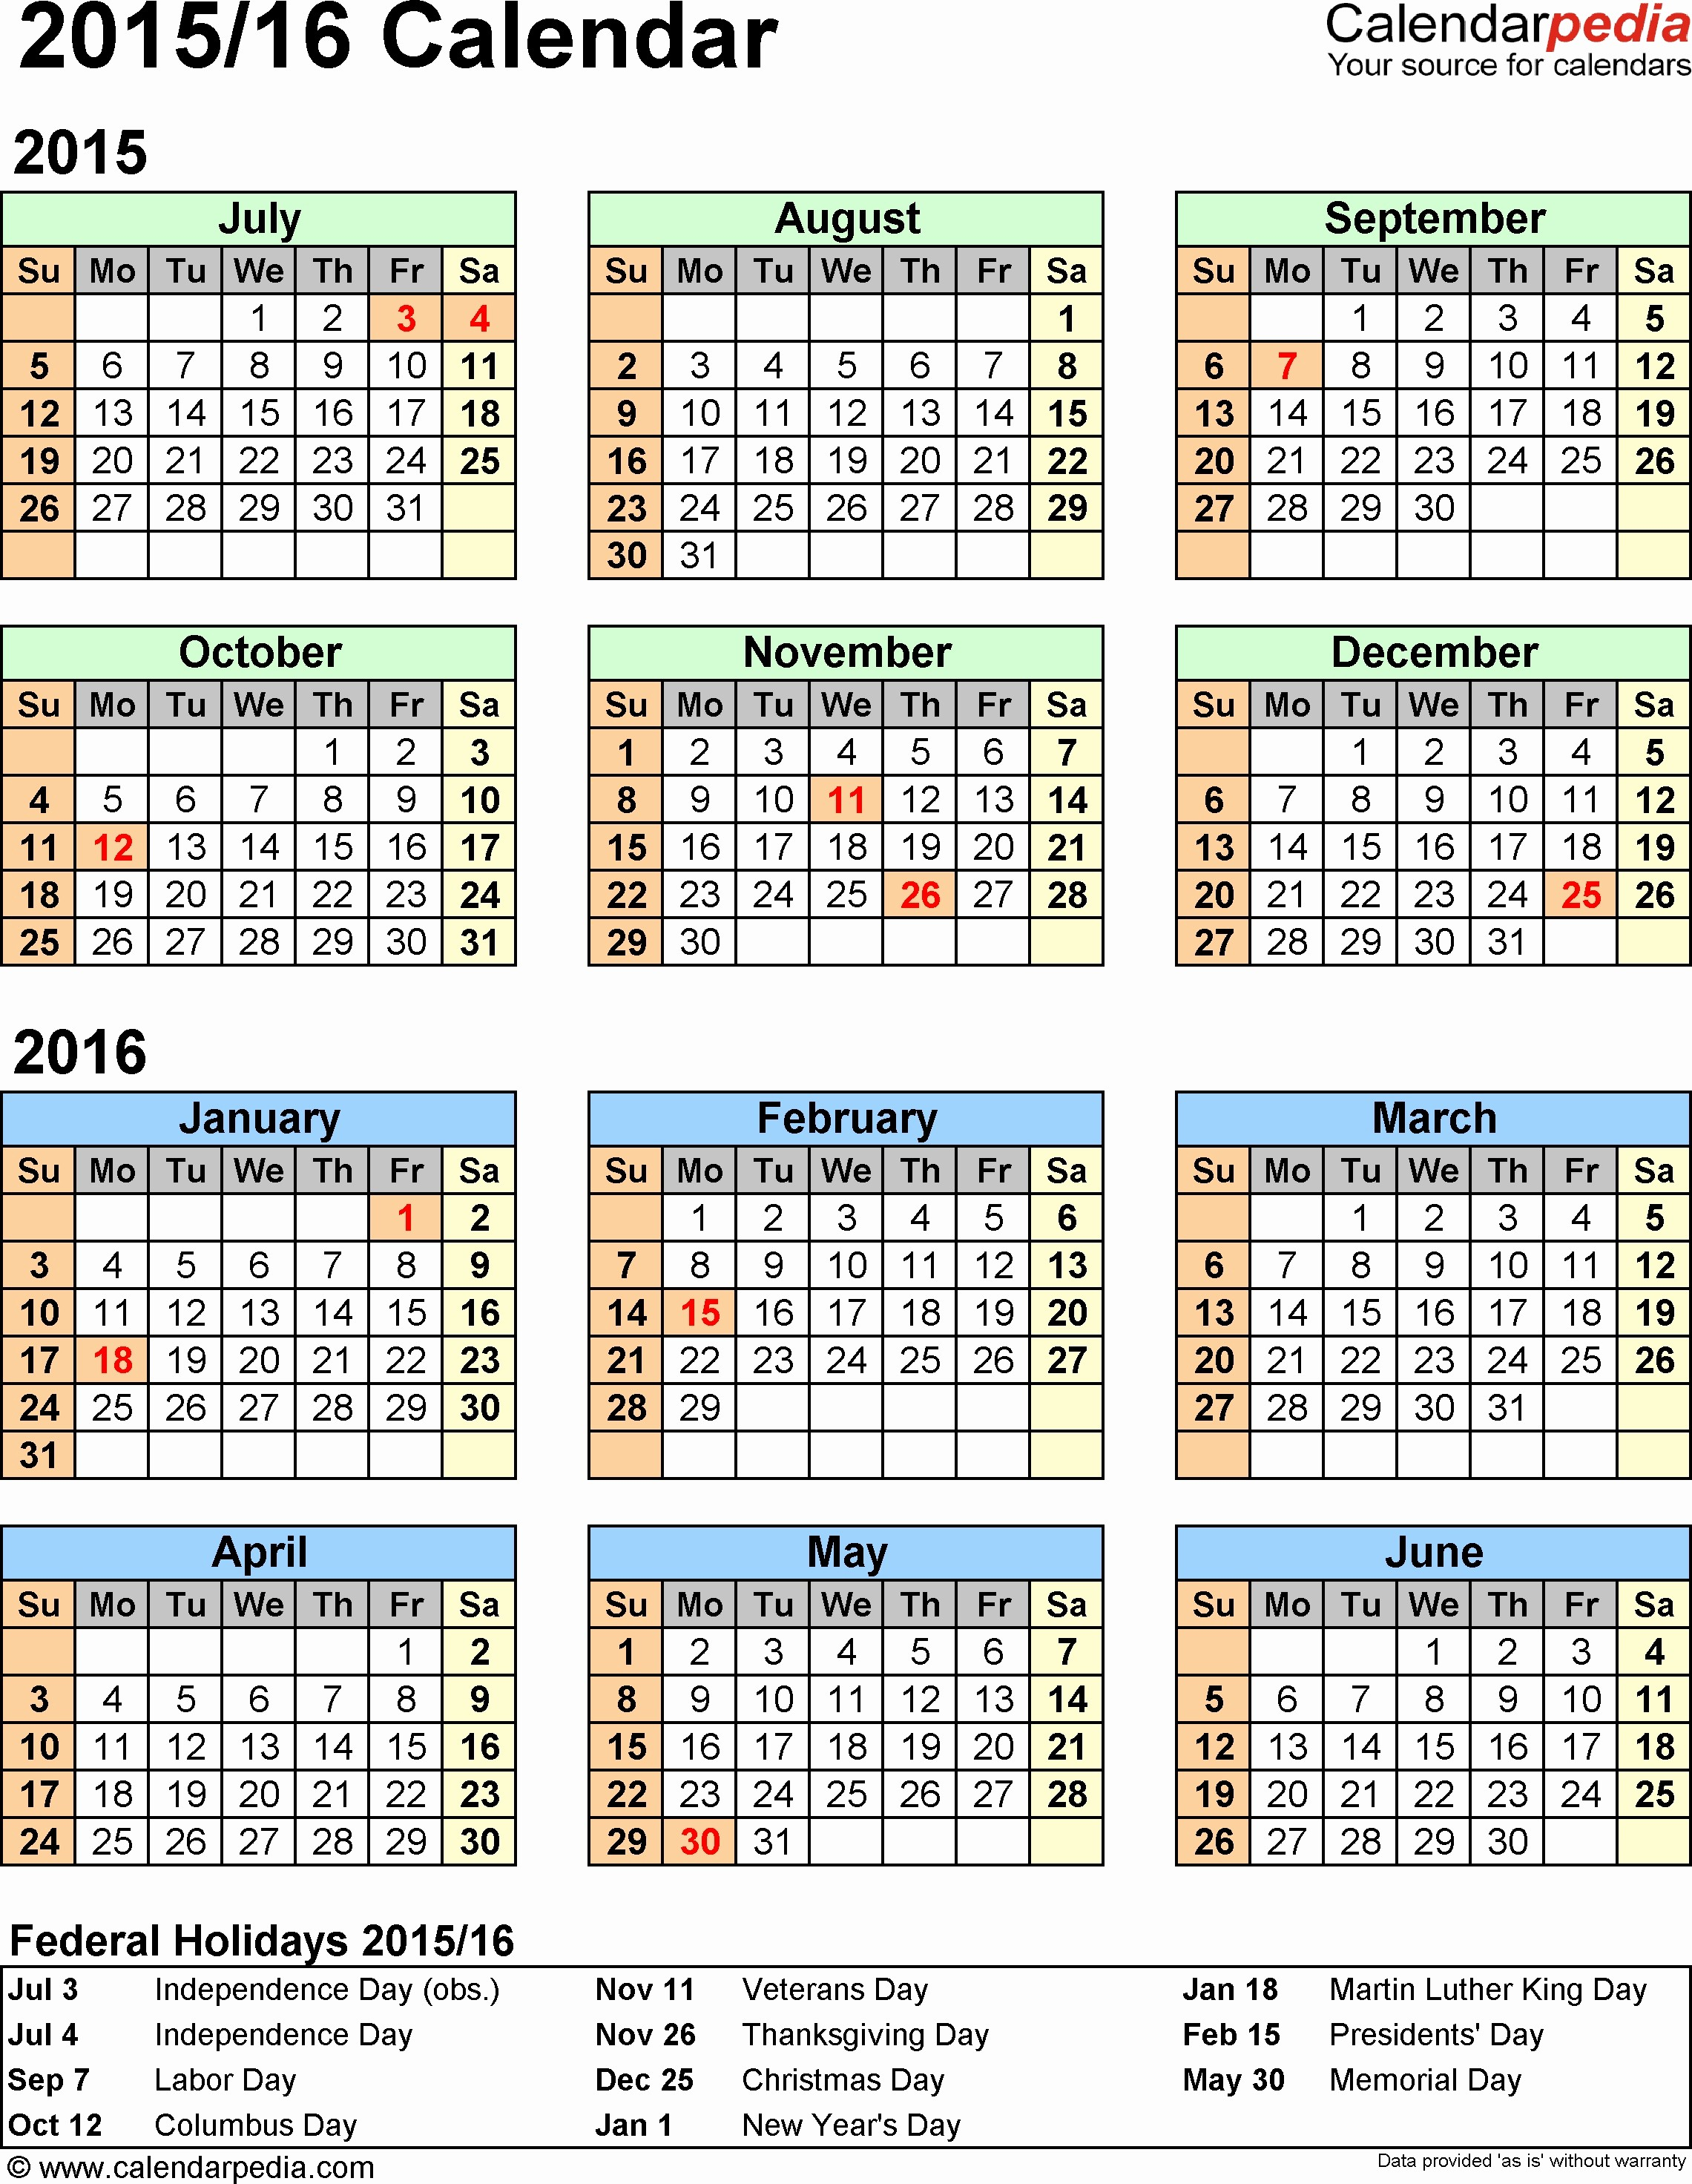 Free 2017 Yearly Calendar Template Inspirational Printable 2016 2017 Financial Year Calendar Kwik Kopy